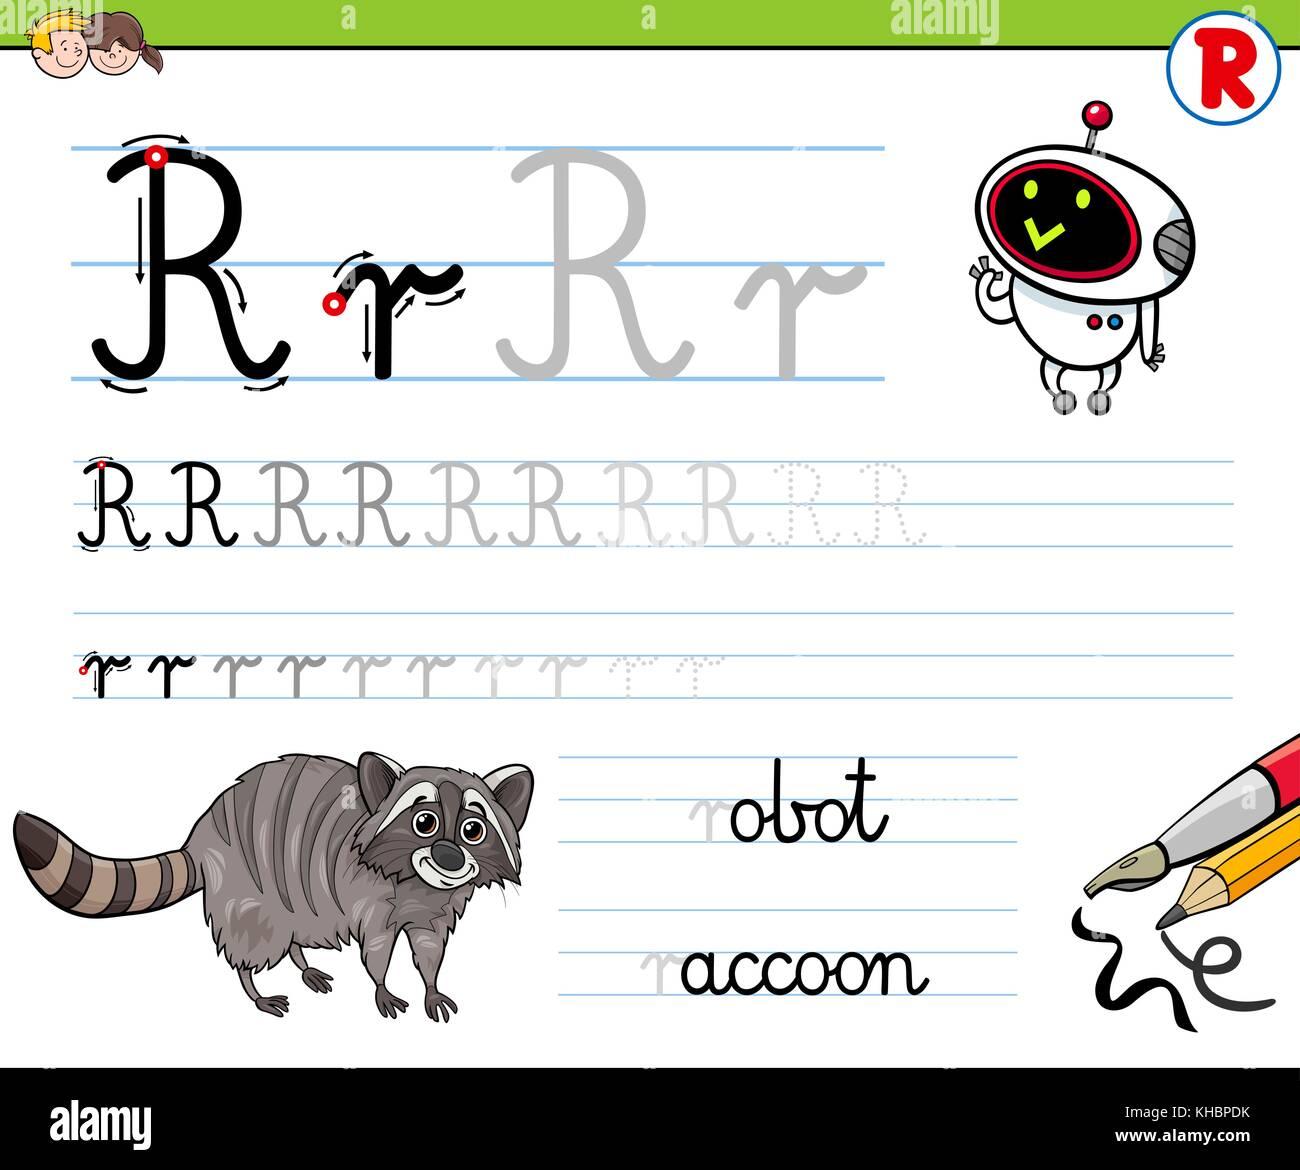 Cartoon Illustration Writing Skills Practice Stock Photos Amp Cartoon Illustration Writing Skills